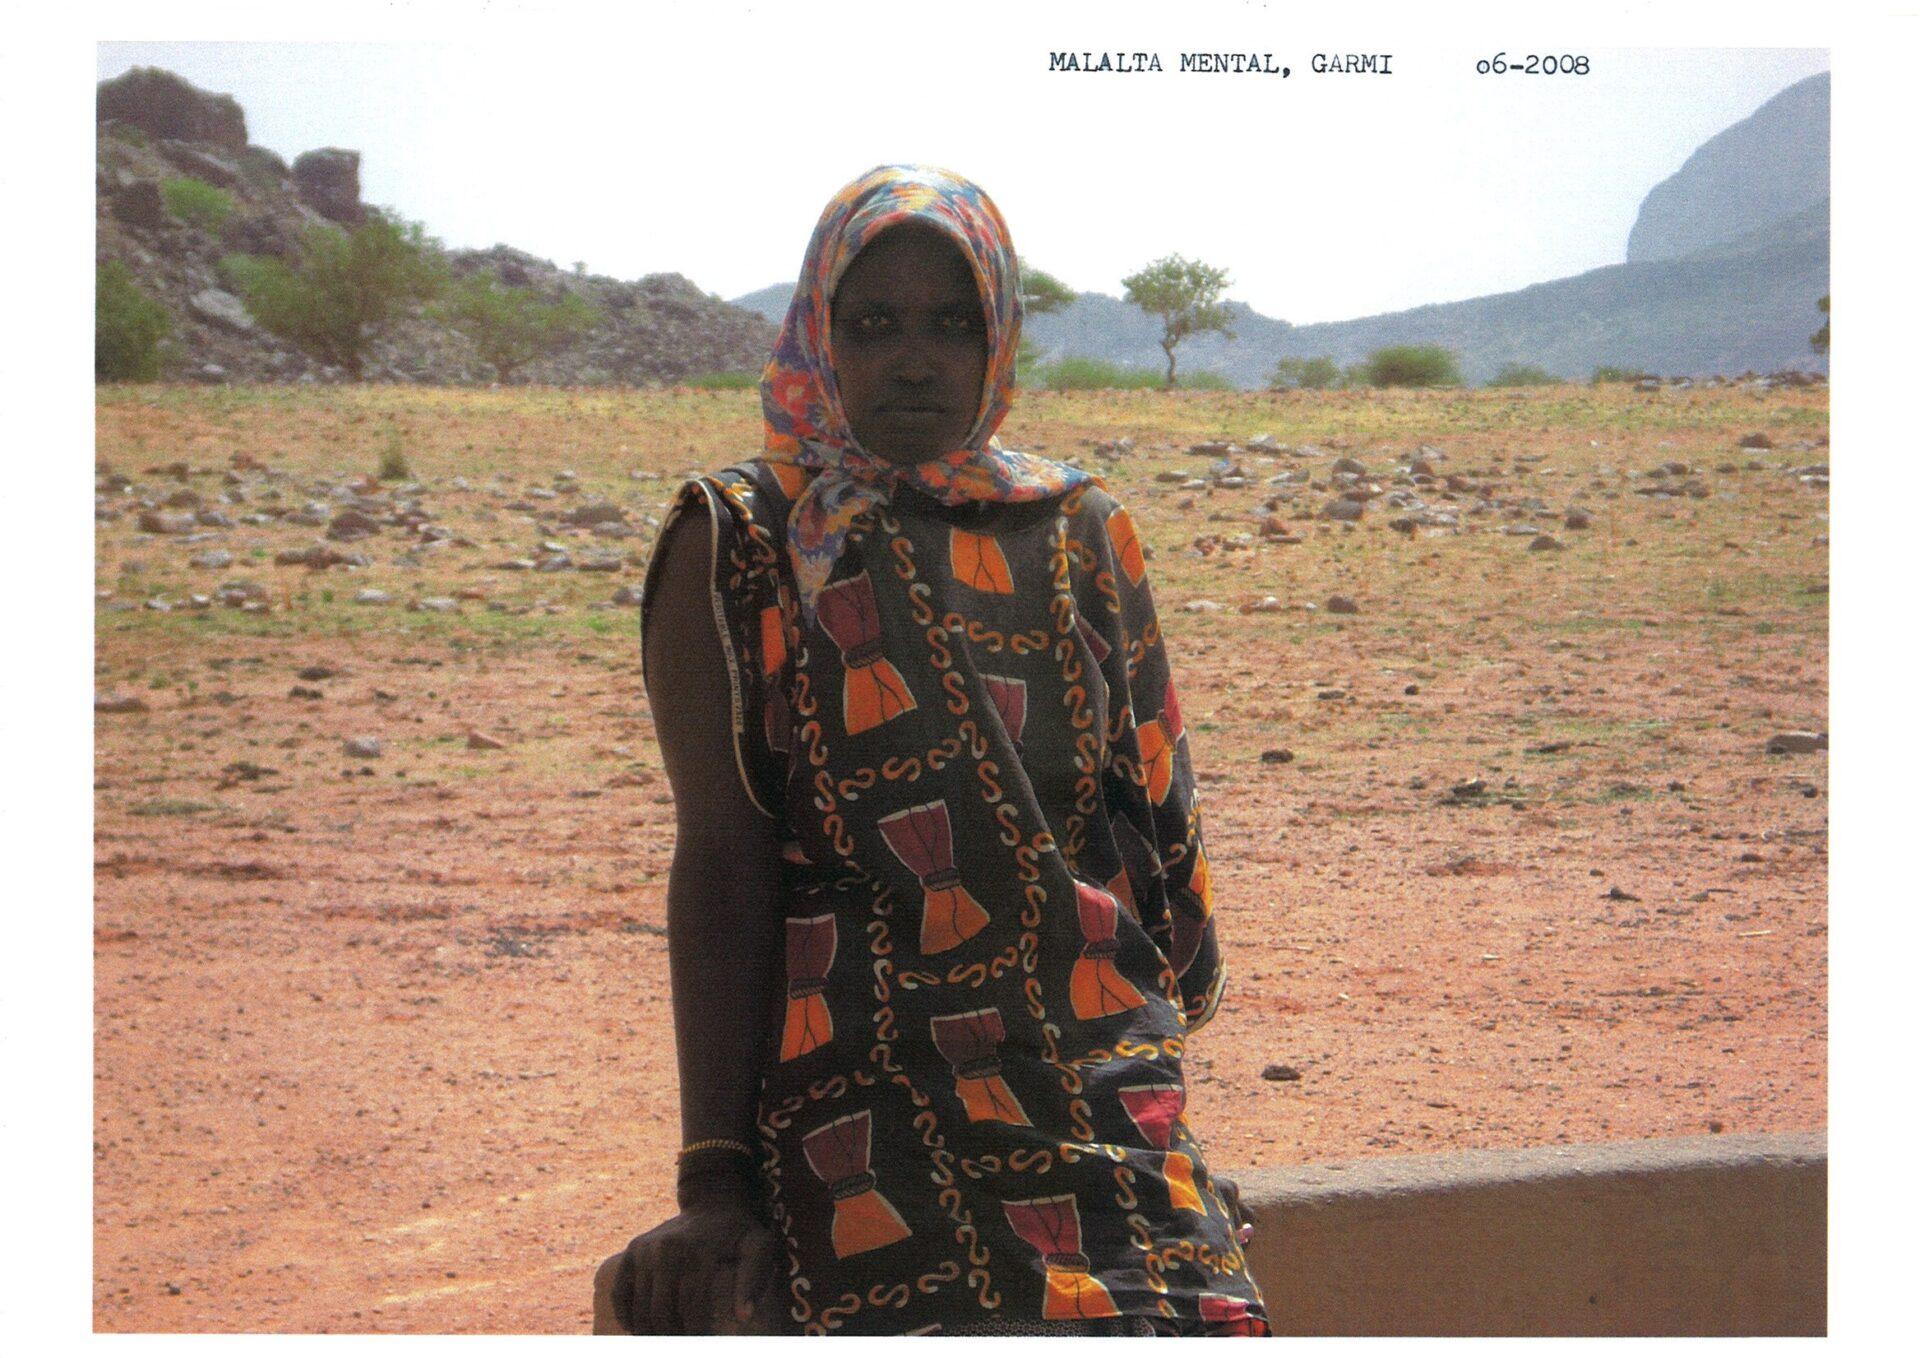 Dona amb malaltia mental a Mali